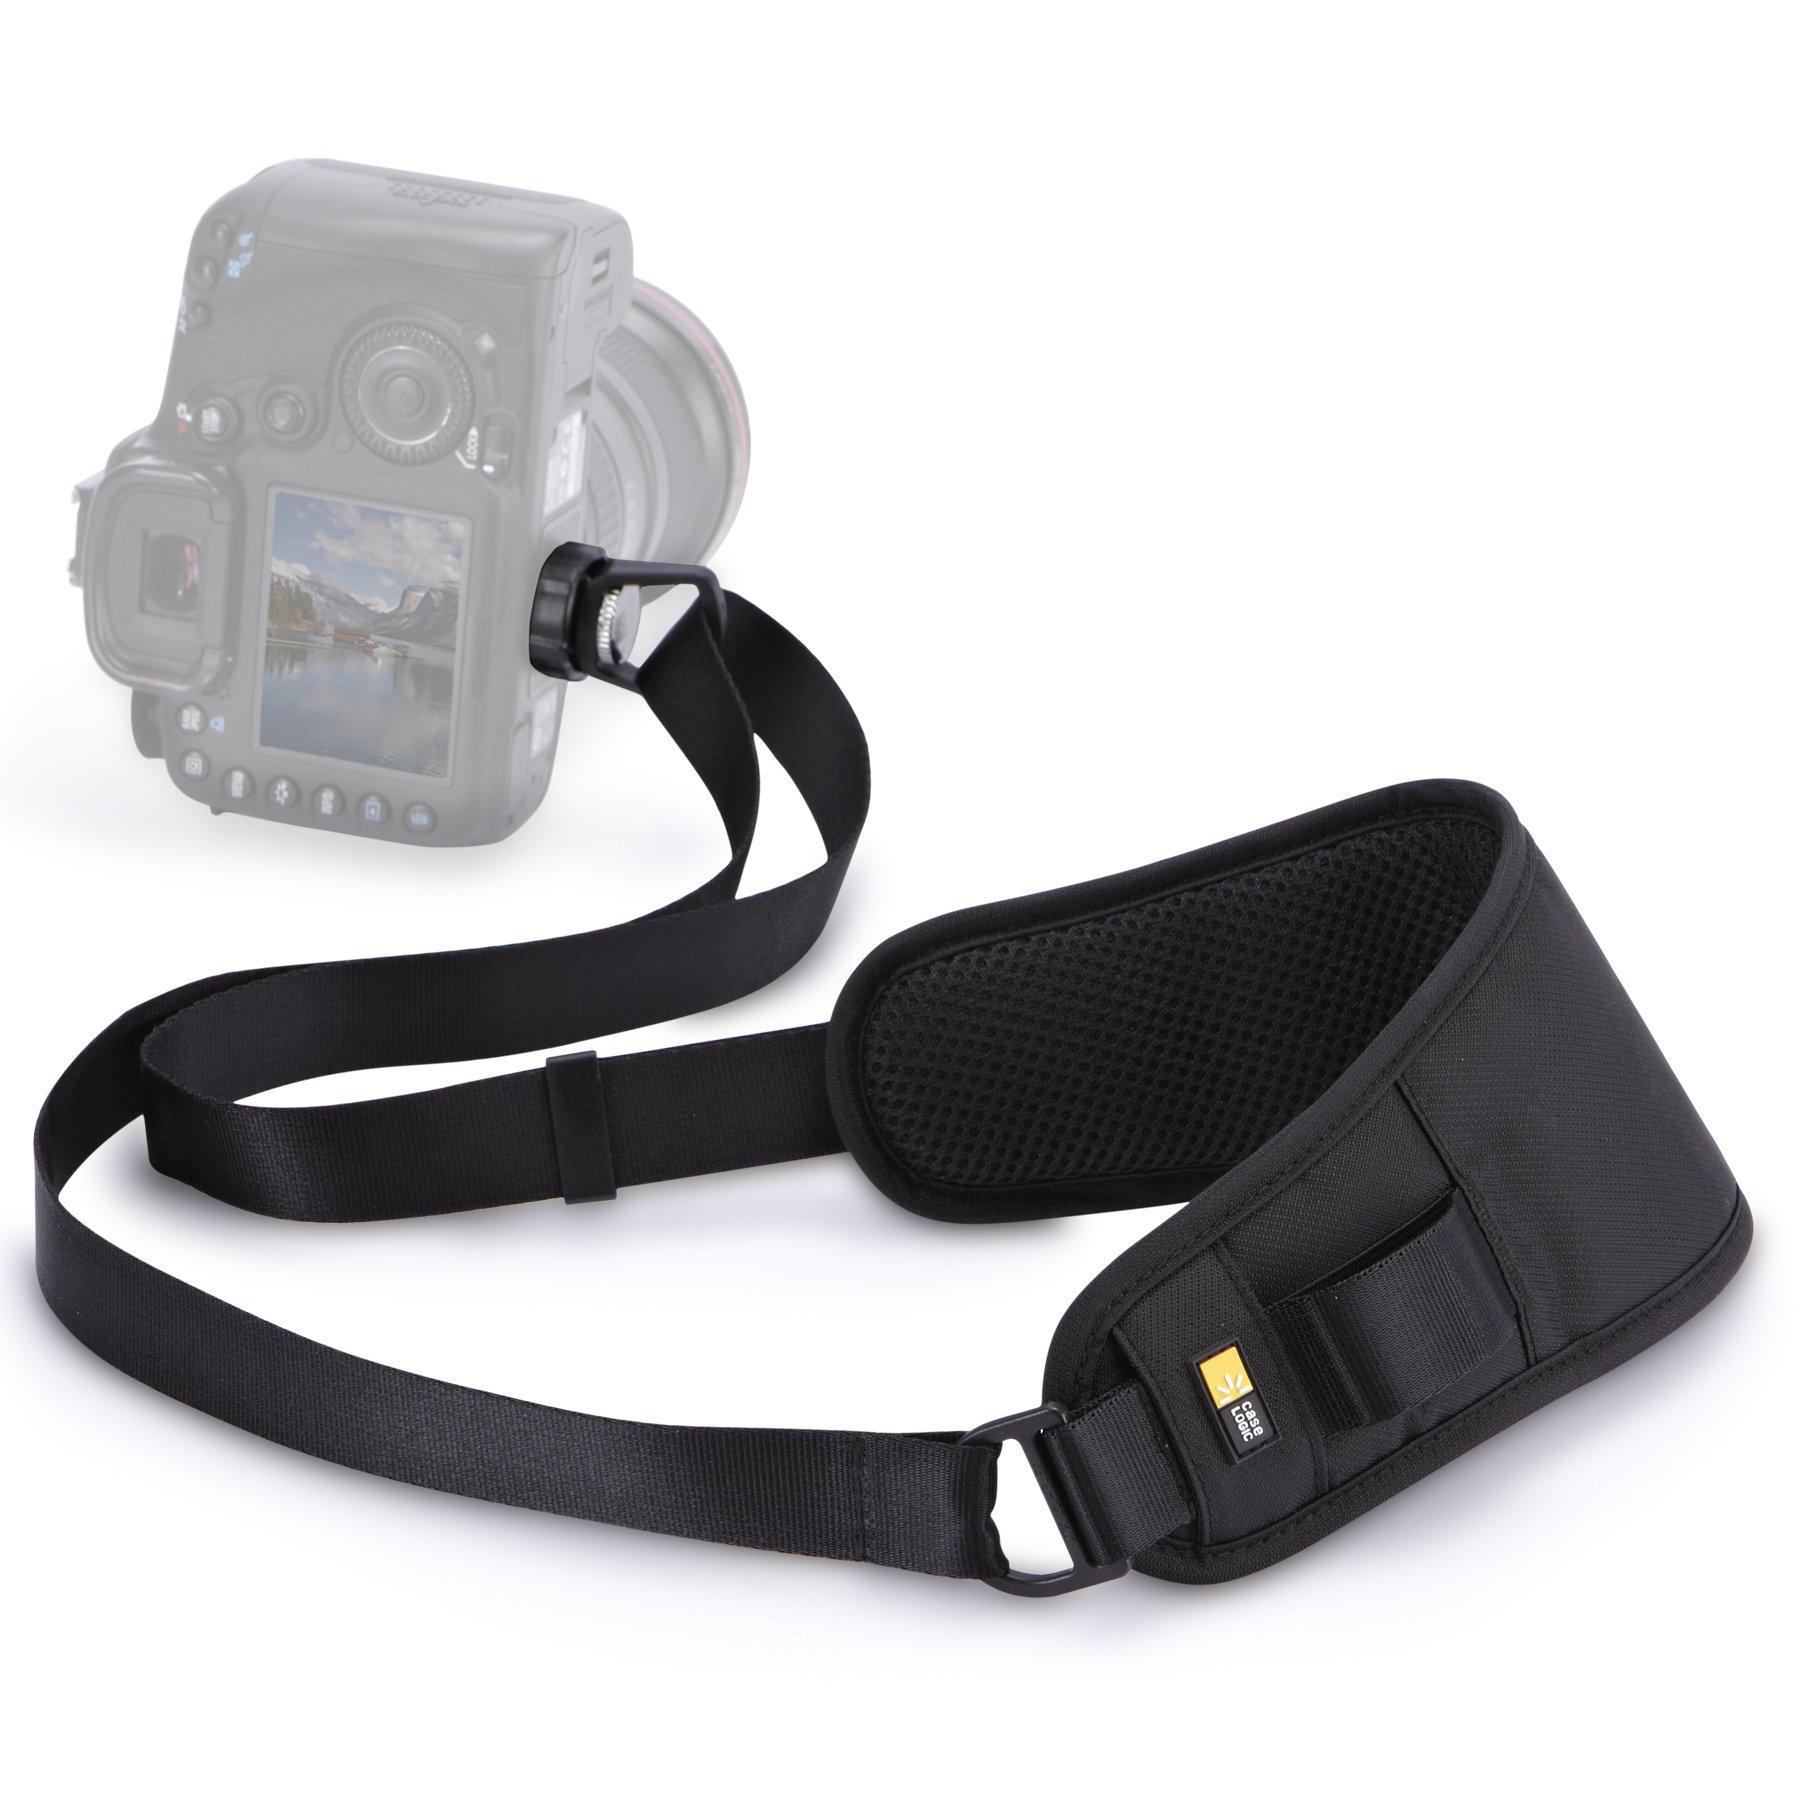 Case Logic DCS101 - Correa para cámara SLR y Accesorios product image